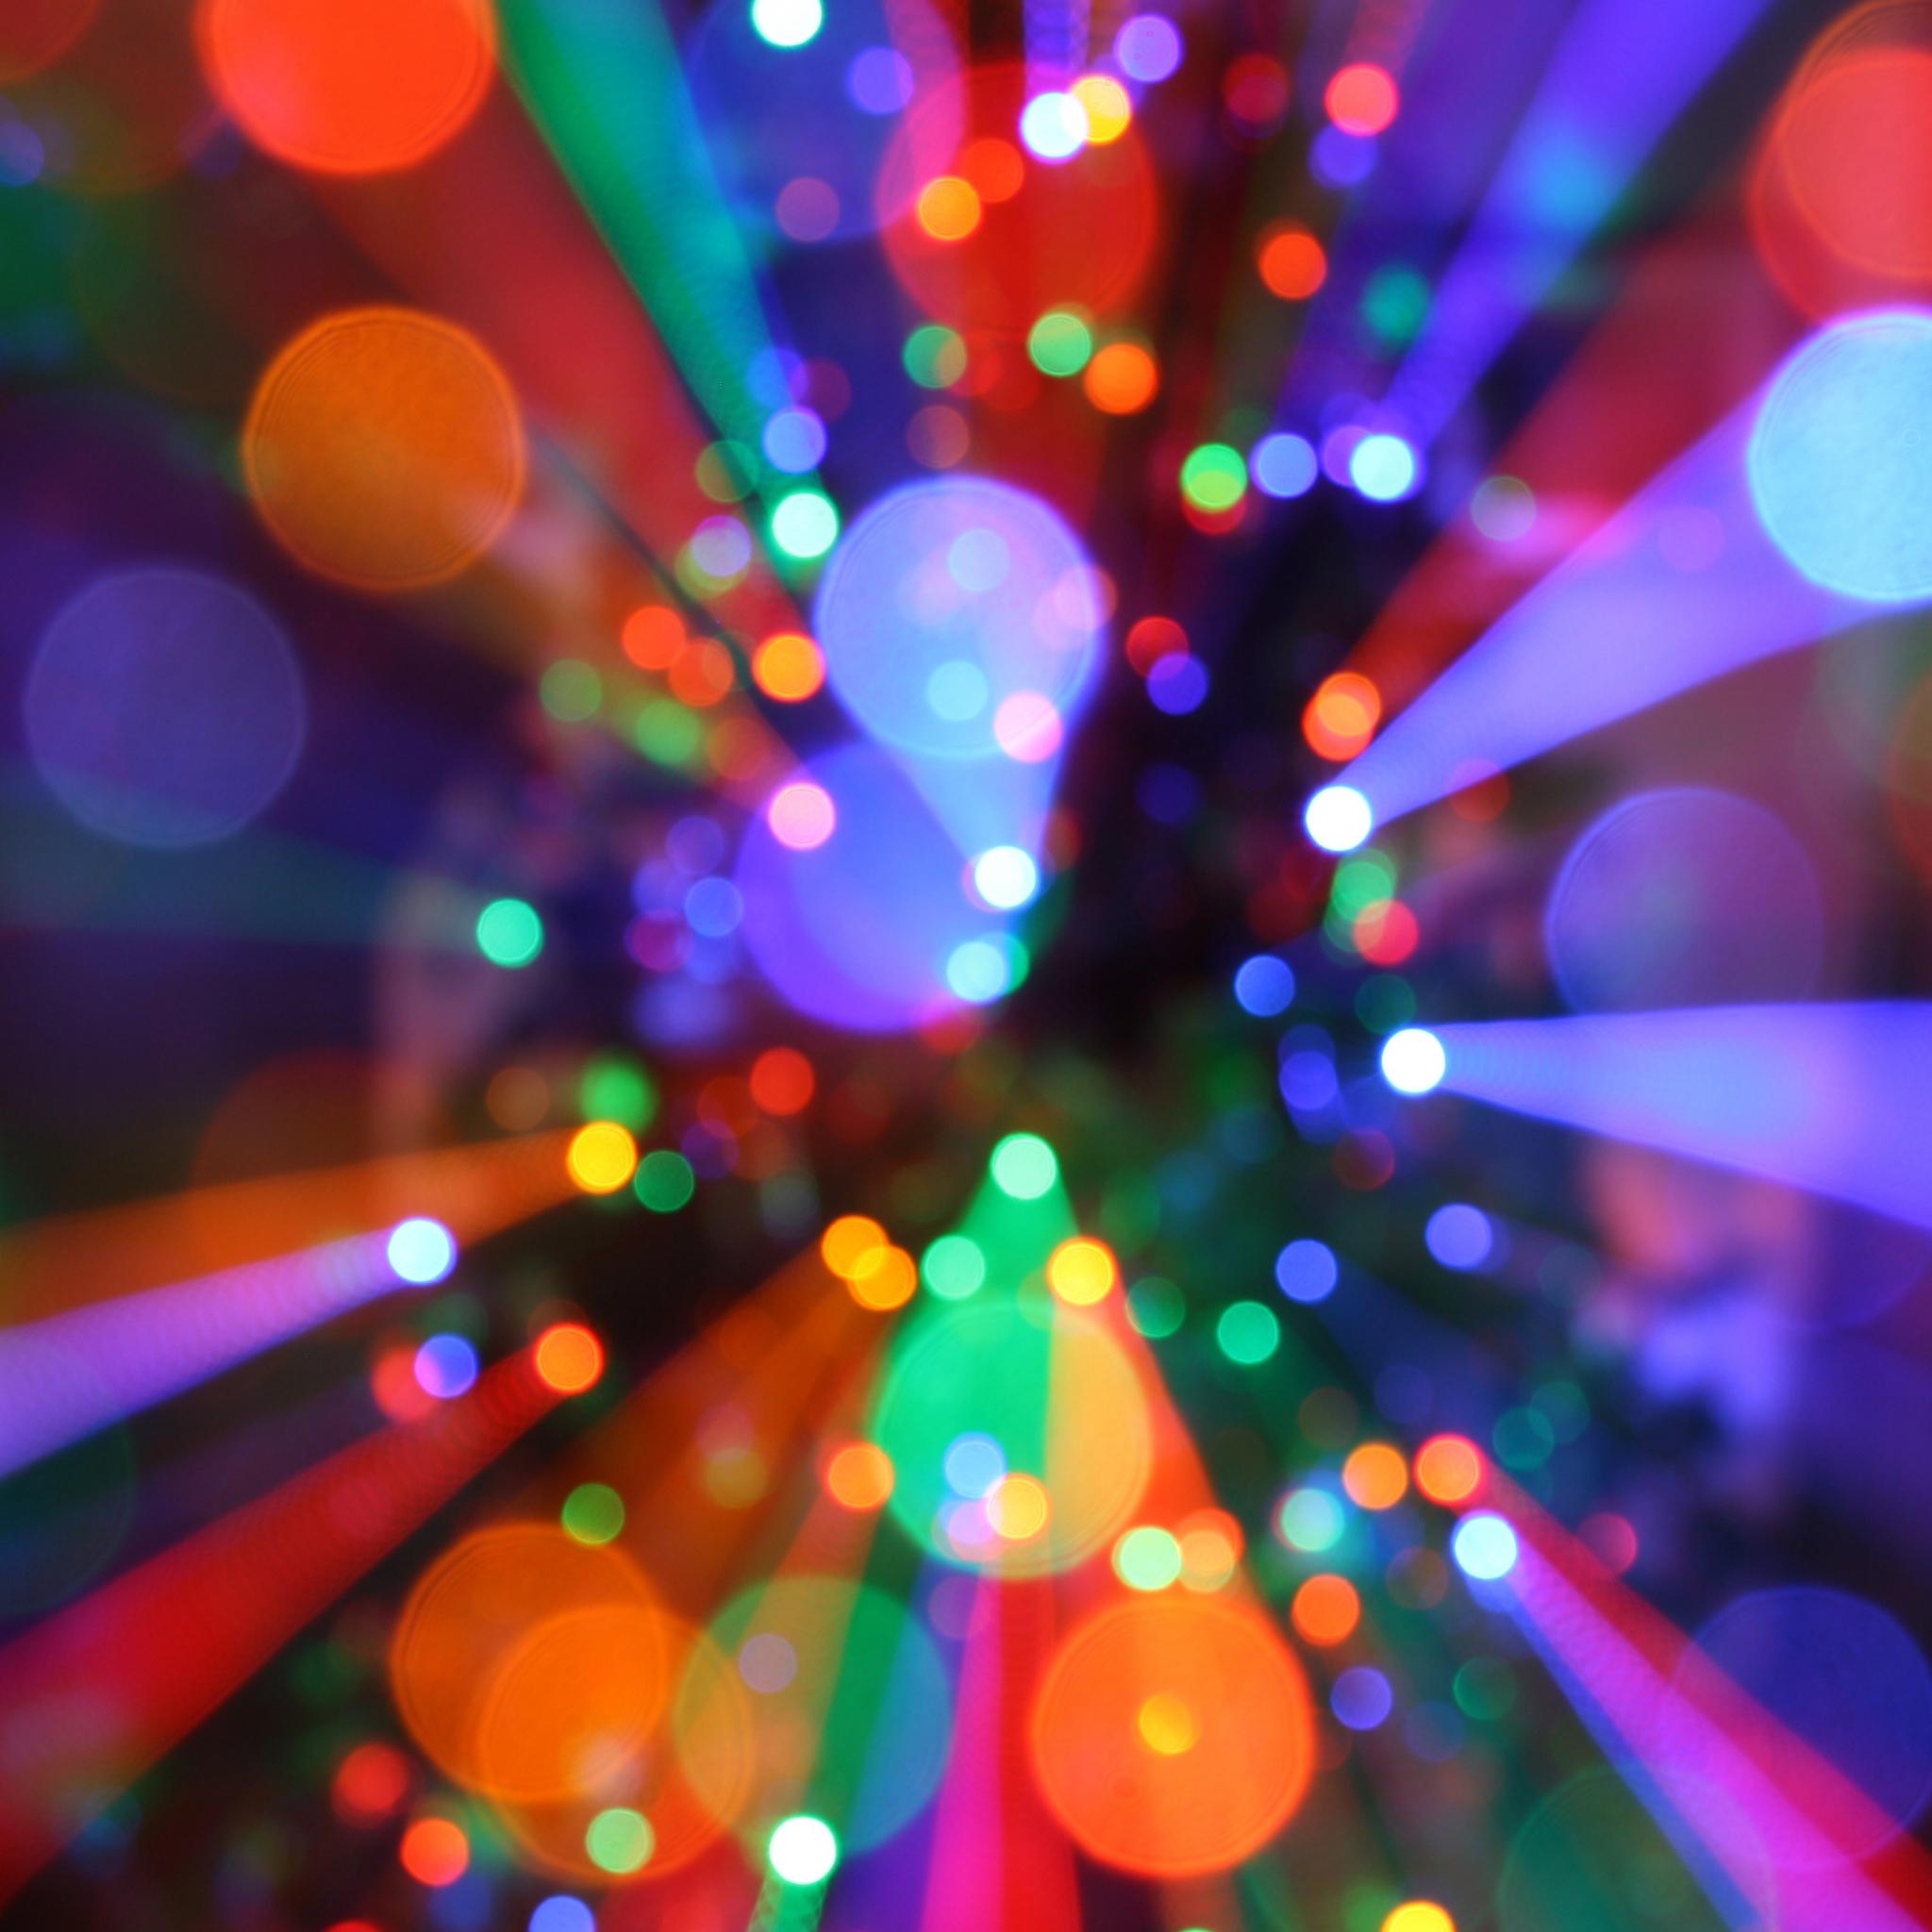 Christmas Lights You Control With Your Phone: 30 De Wallpaper-uri Retina Pentru IPhone, IPod Touch, IPad